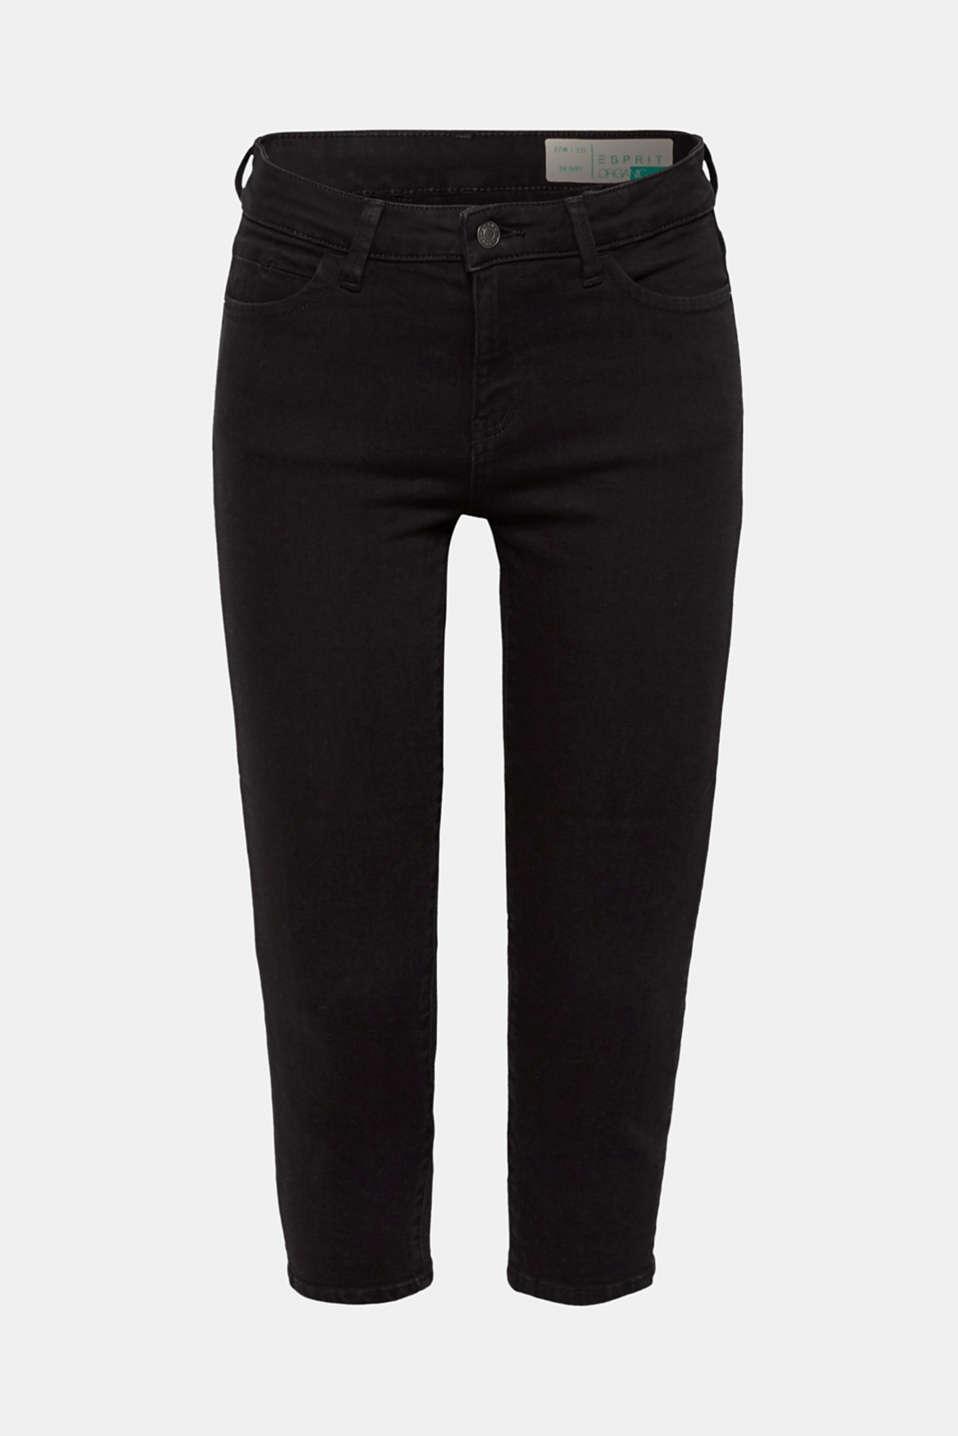 Pants denim, BLACK RINSE, detail image number 8